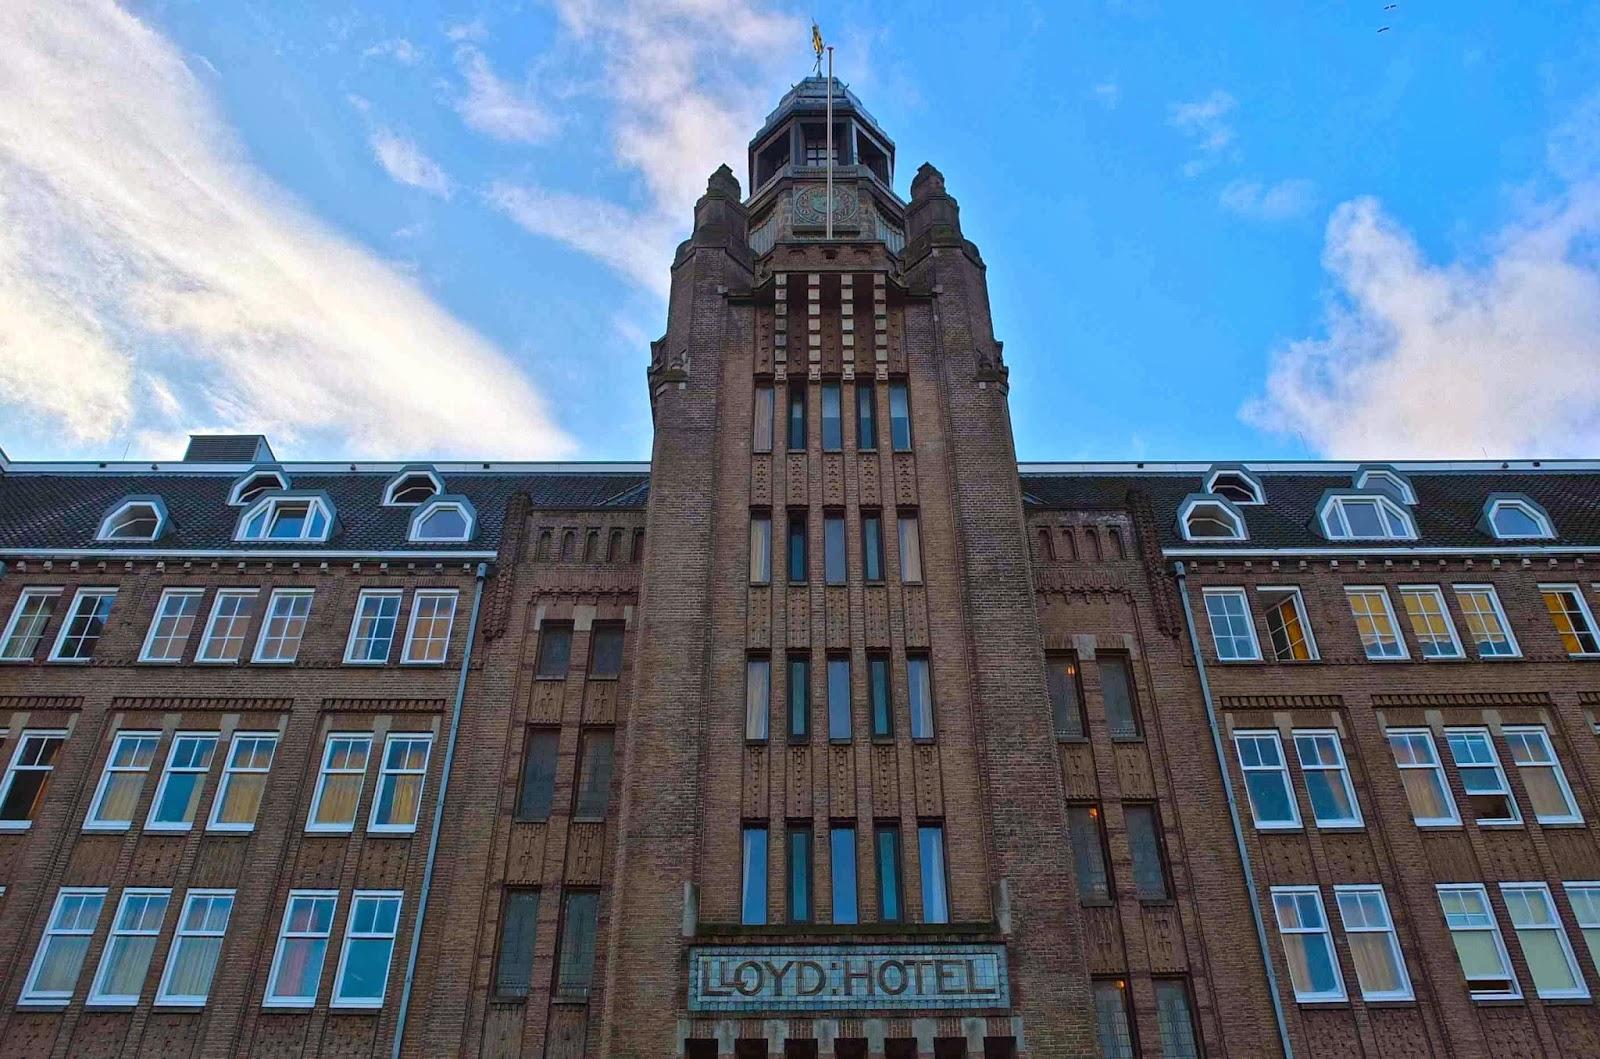 slavia vintage le blog de l 39 est design d co et lifestyle lloyd hotel amsterdam. Black Bedroom Furniture Sets. Home Design Ideas